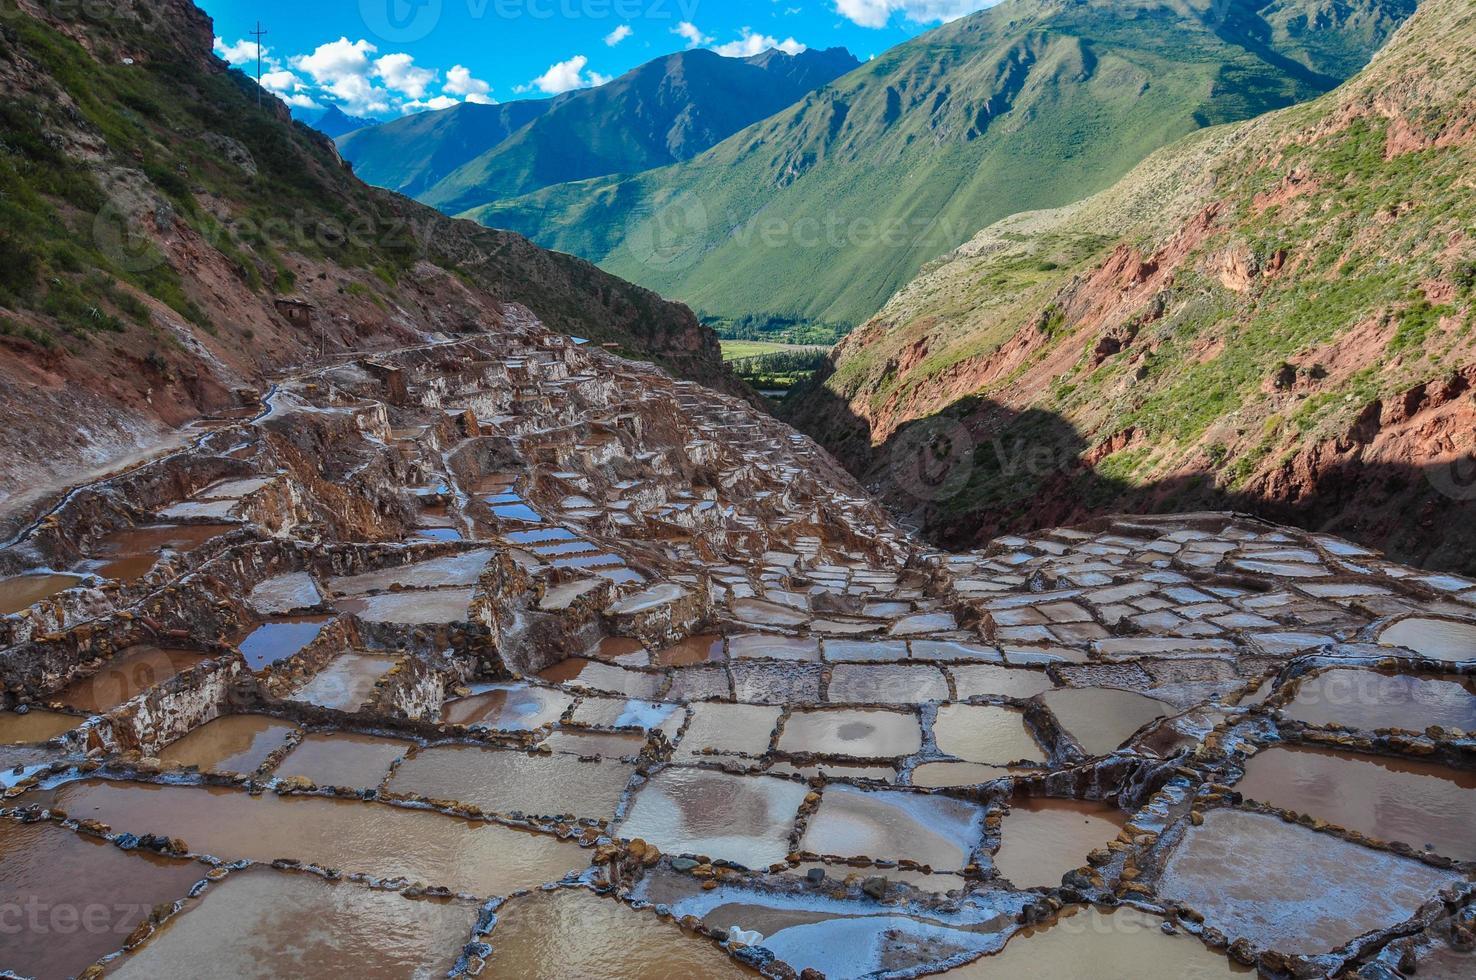 salinas de maras, valle sacra, perù foto